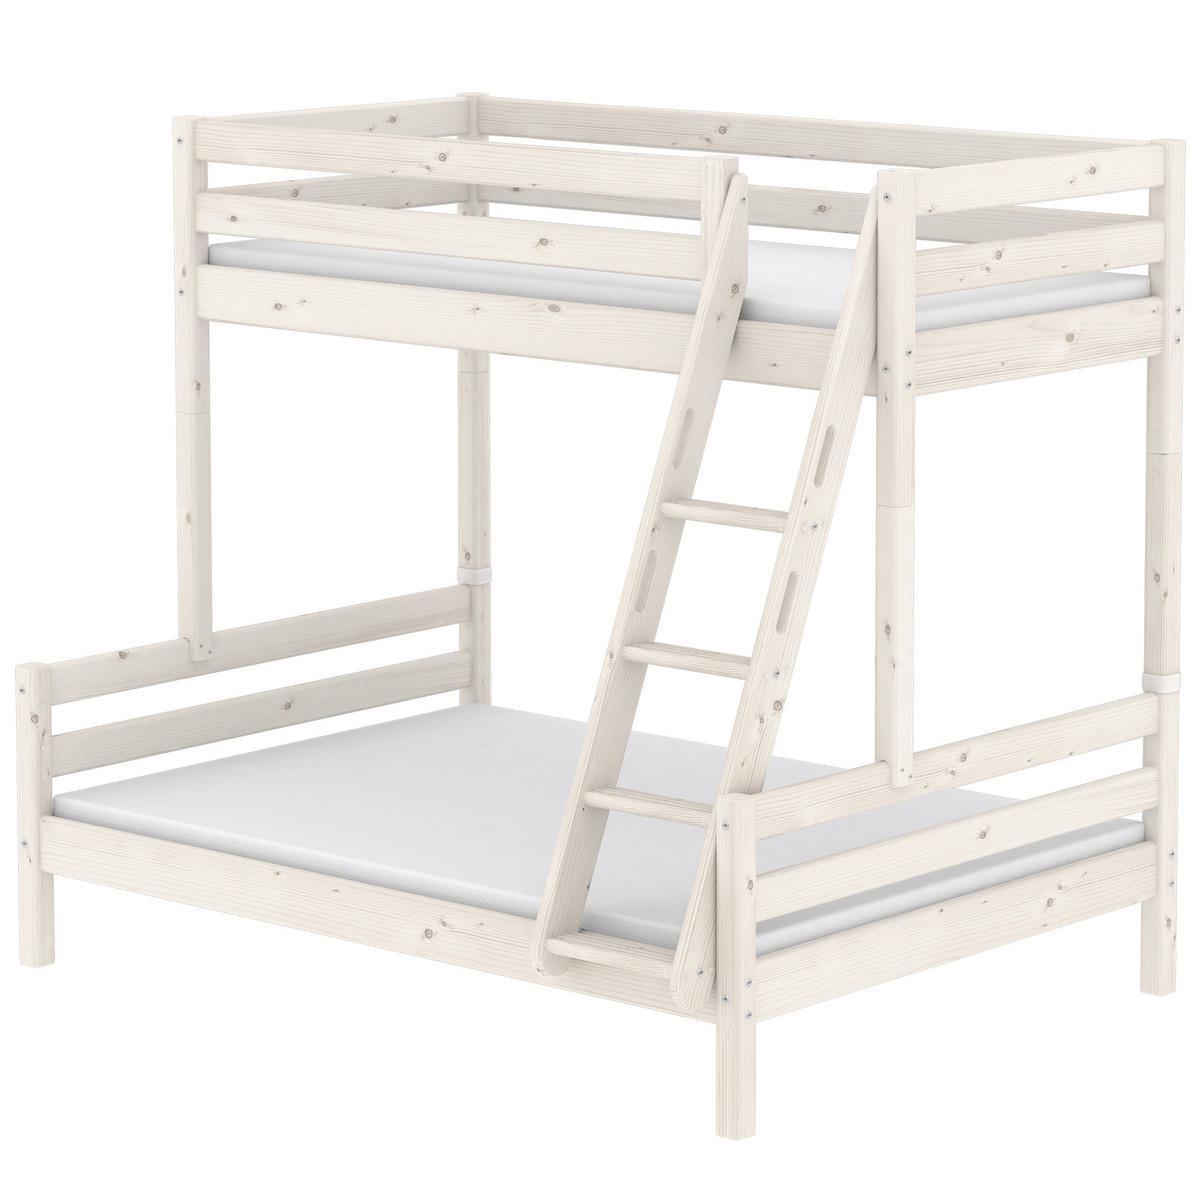 Etagenbett 90x200cm + Doppelbett 140x200c + geneigte Leiter CLASSIC by Flexa